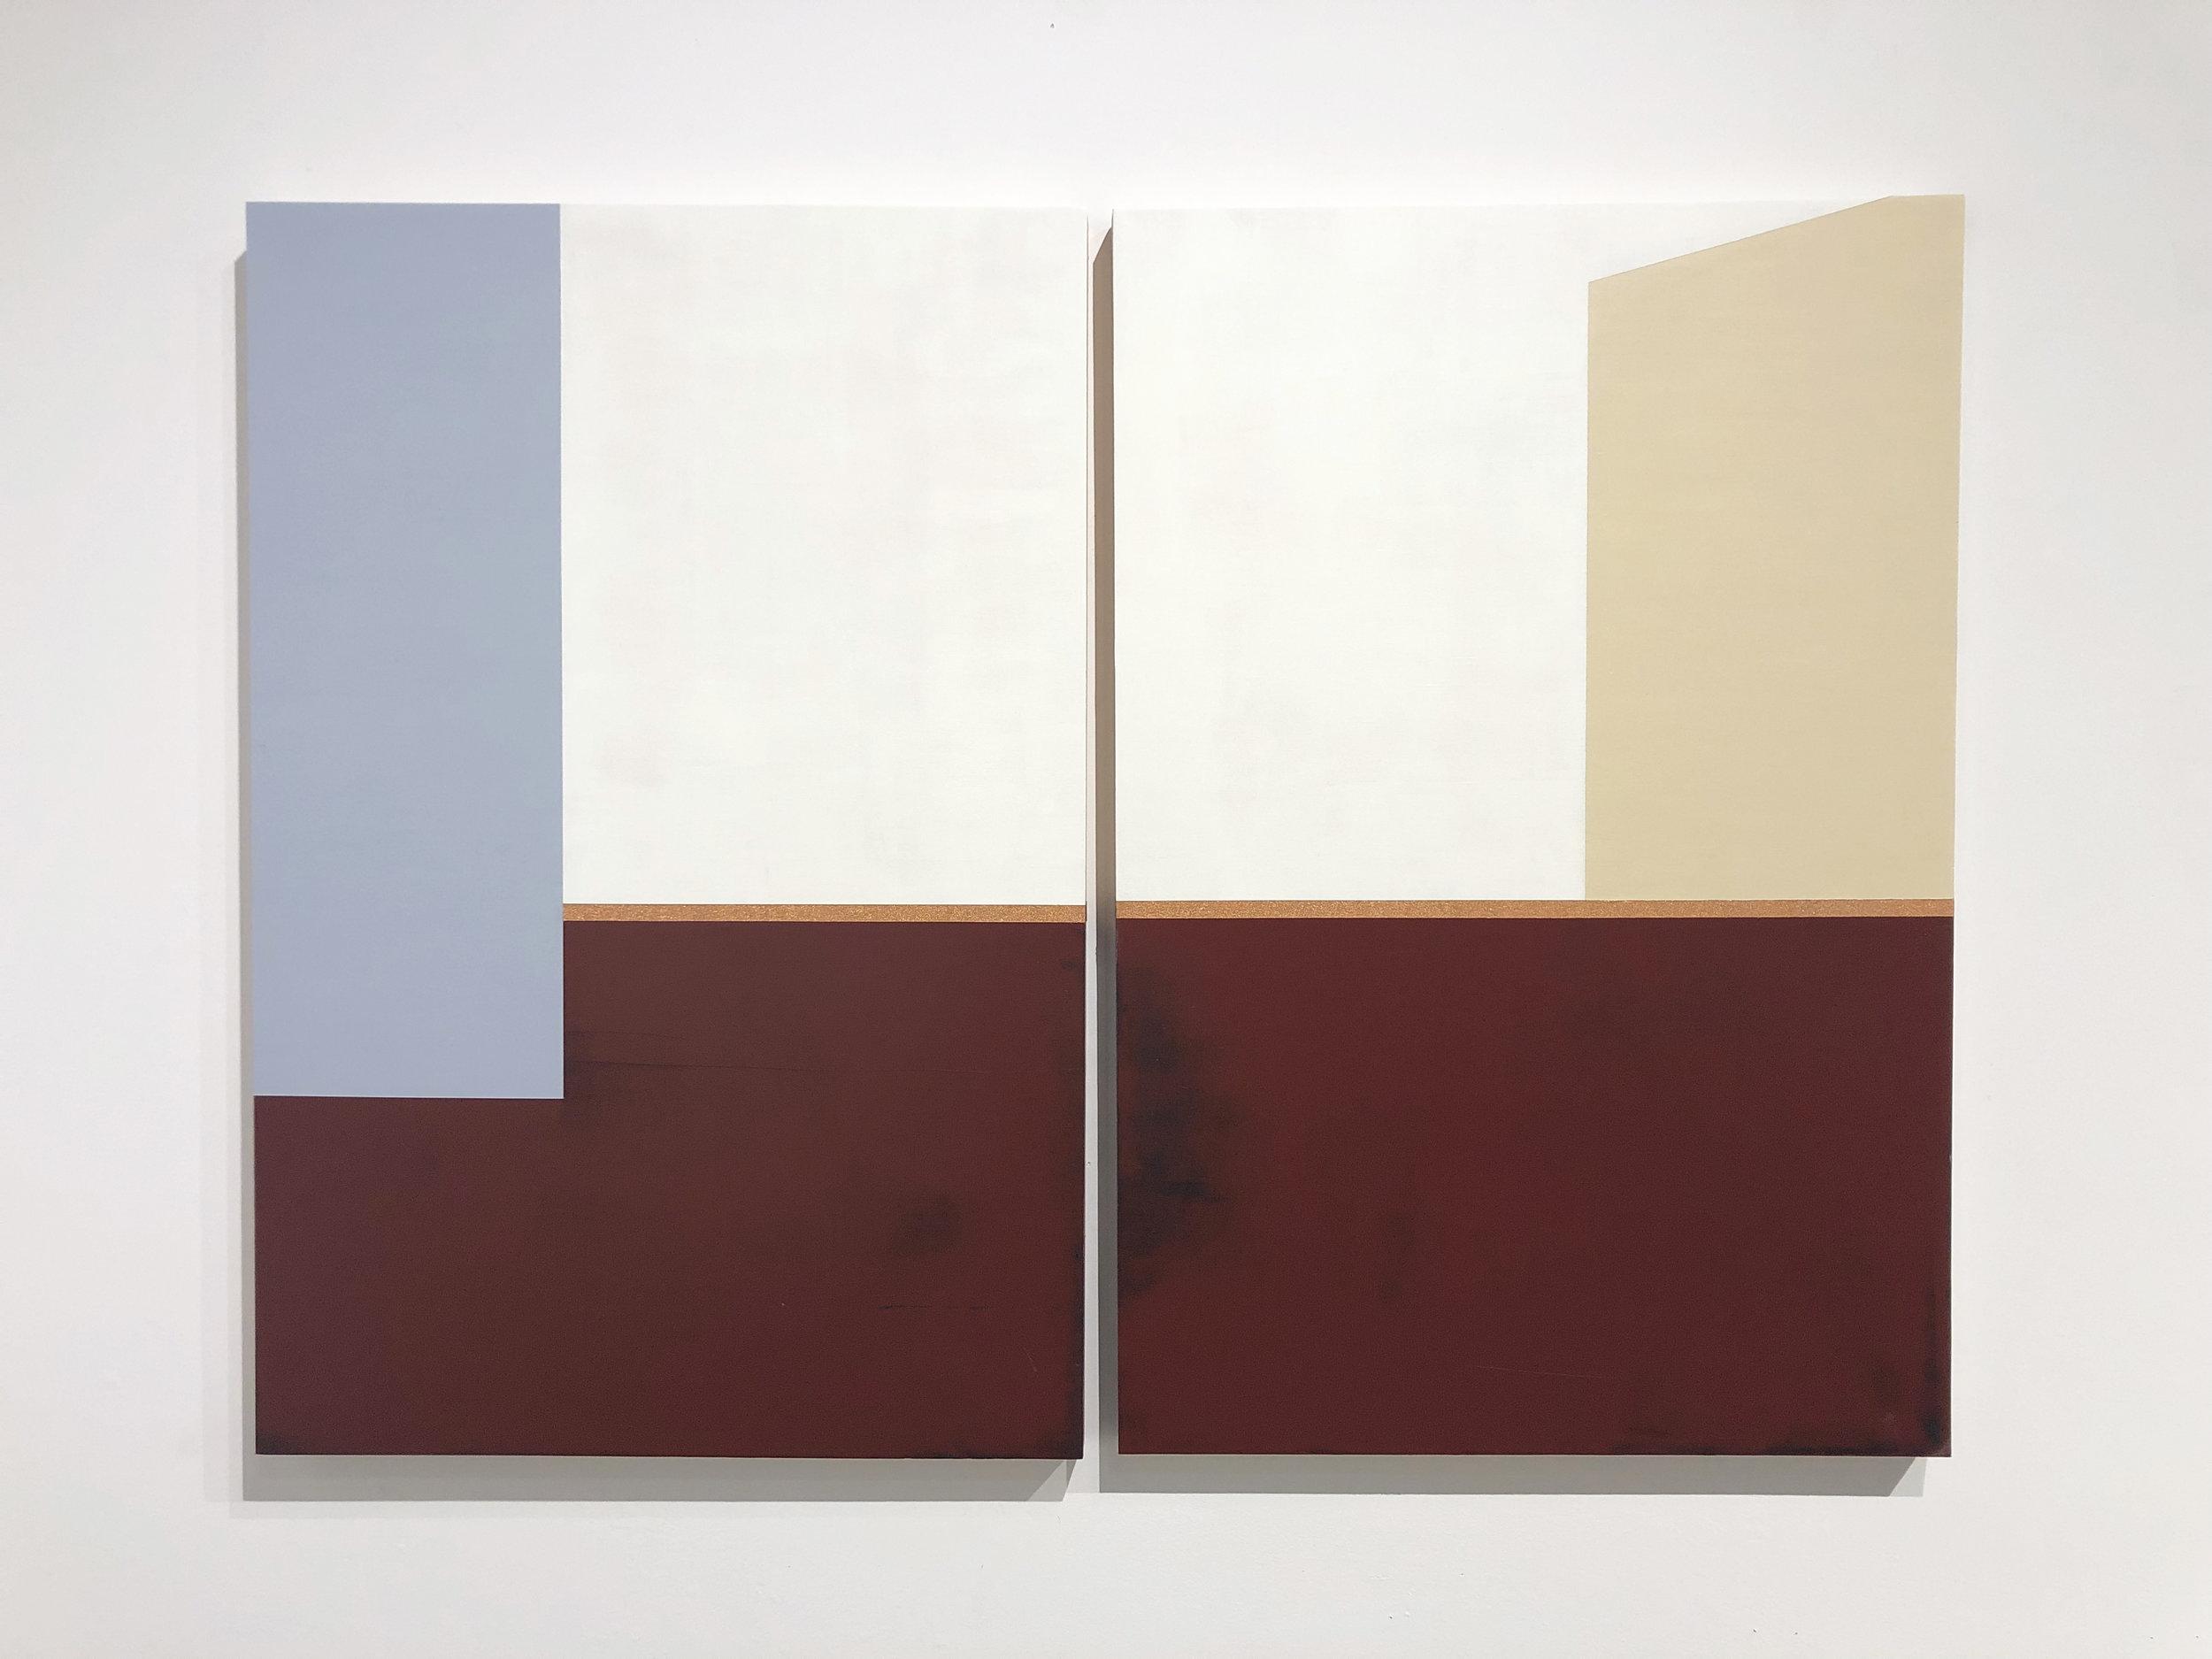 "Intimate Fragments  Each panels sized 36"" x 24"" Acrylic on wood panels 2018"